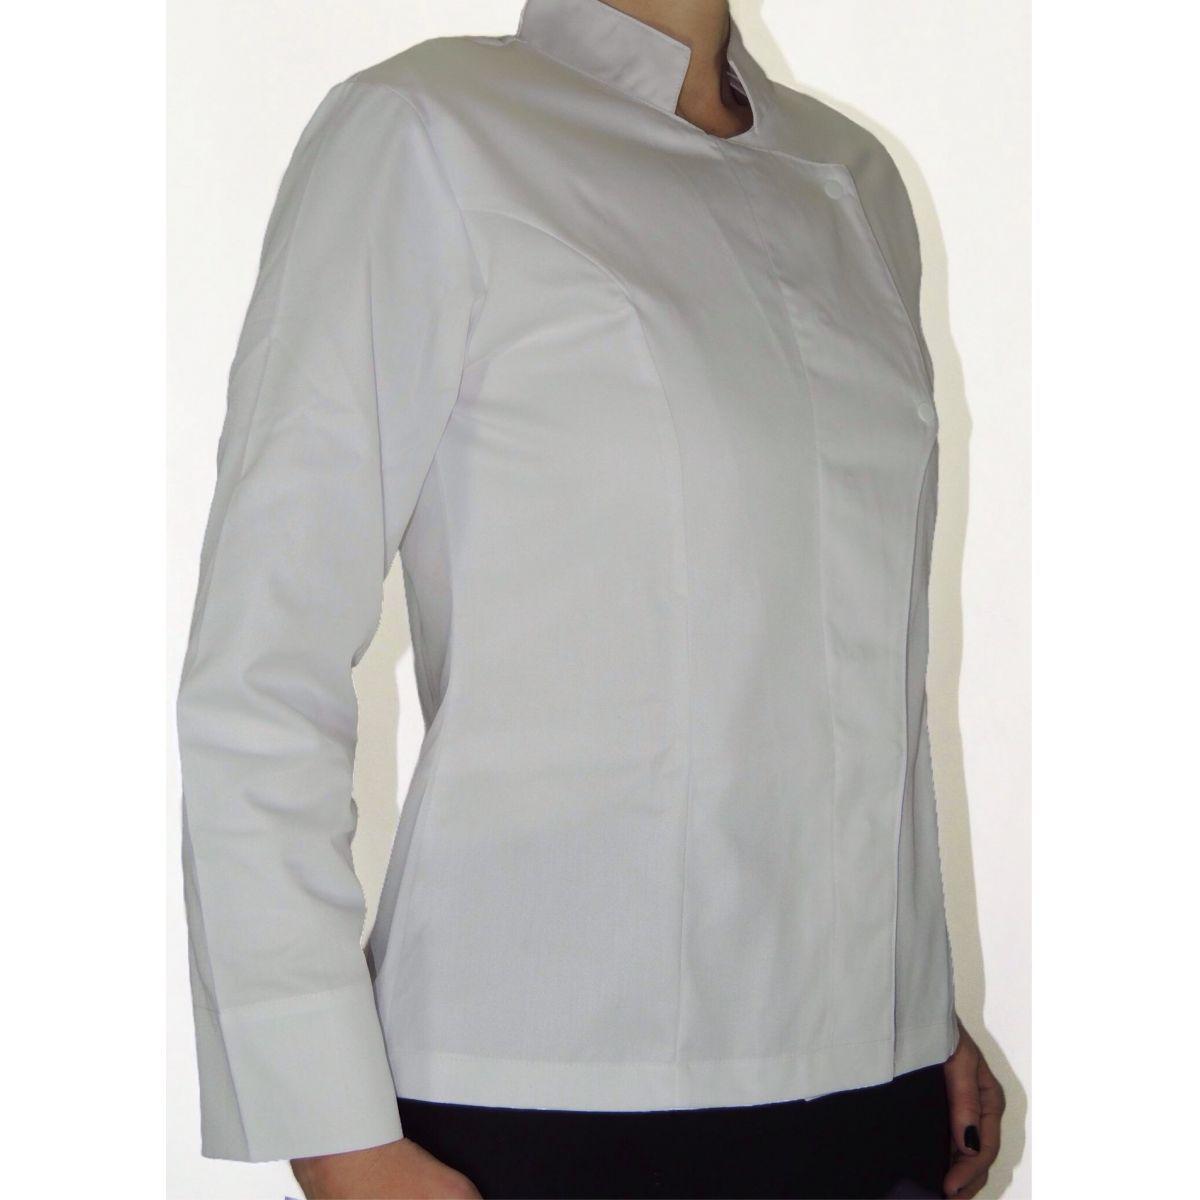 Dólmã Grace Feminina Acinturada MEXICAN SKULL BRANCA - Sarja 100% algodão Branco